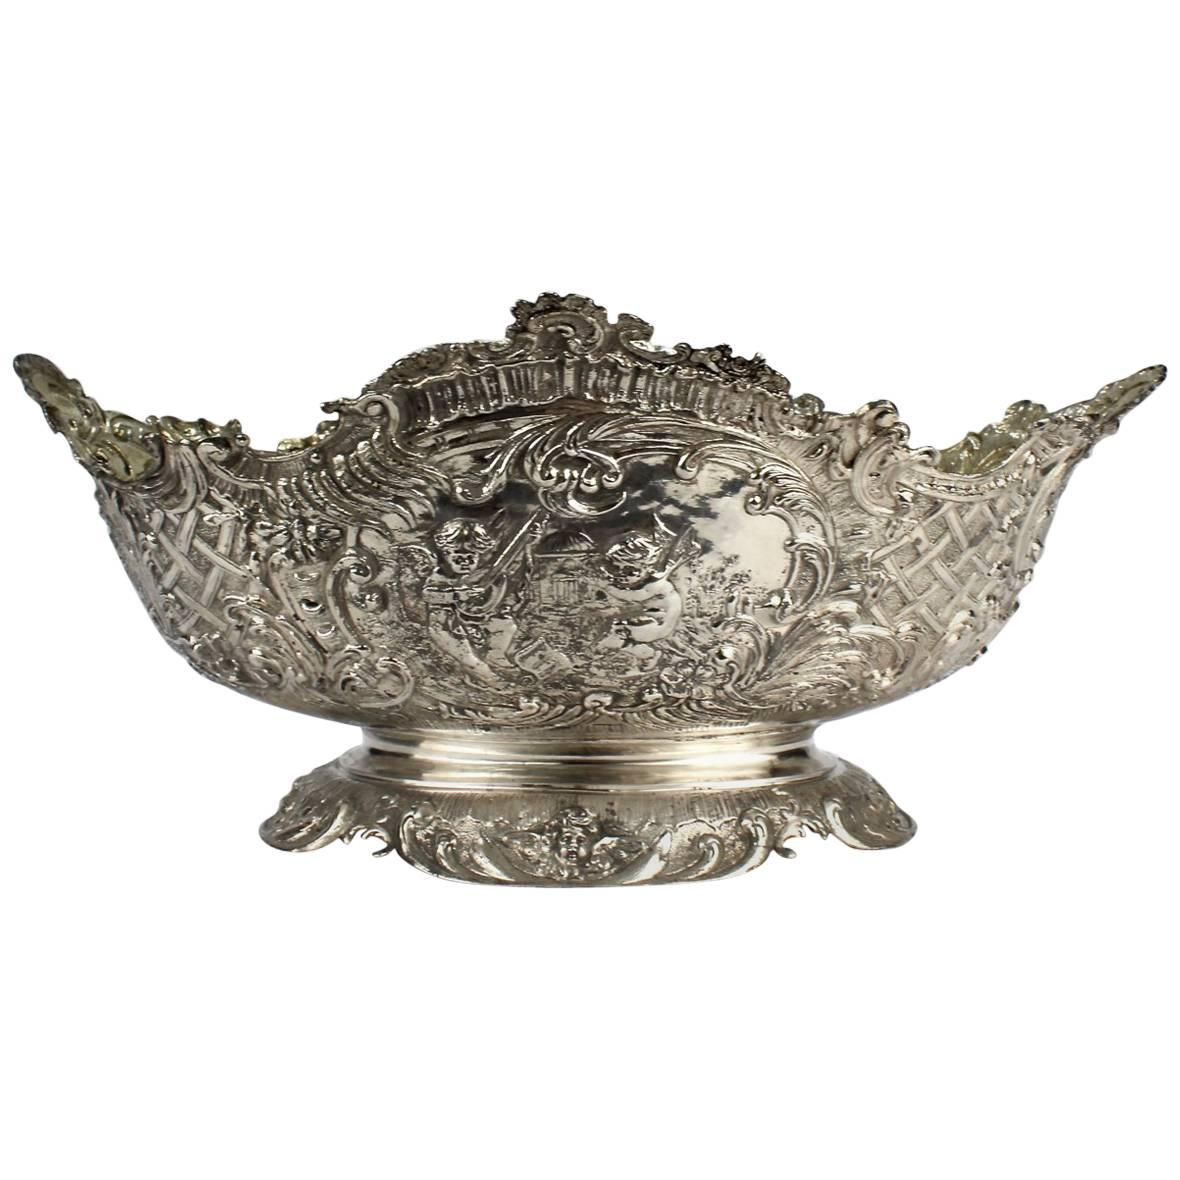 19th Century German Rococo Revival Repoussé 800 Silver Centerpiece or Bowl